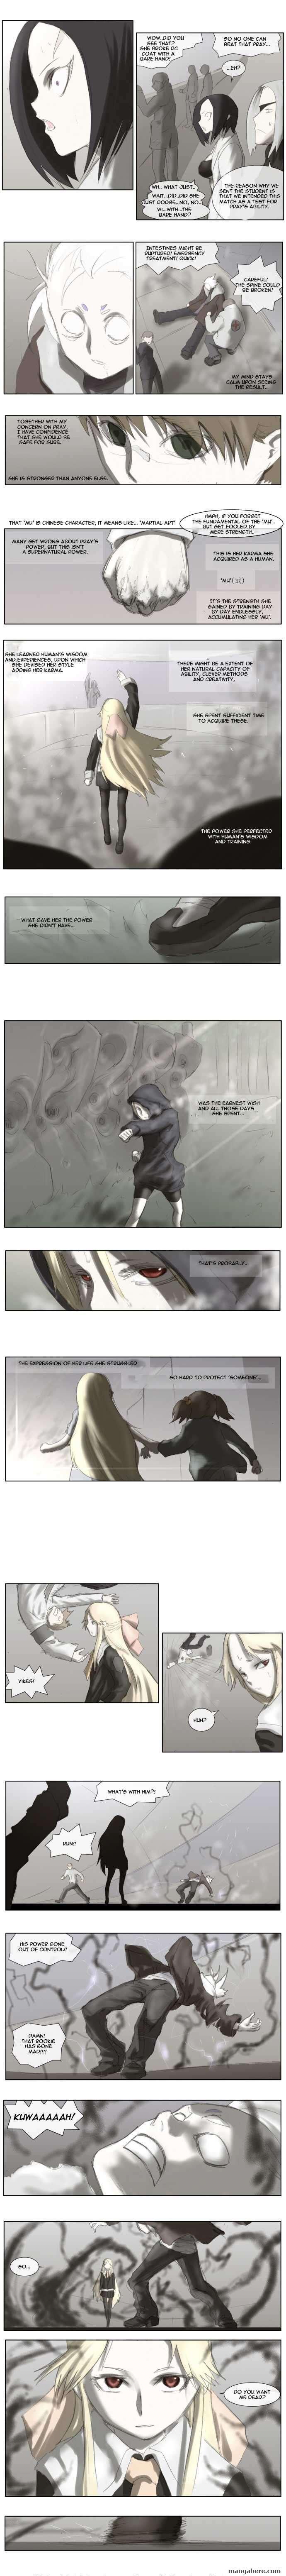 Knight Run 15 Page 3